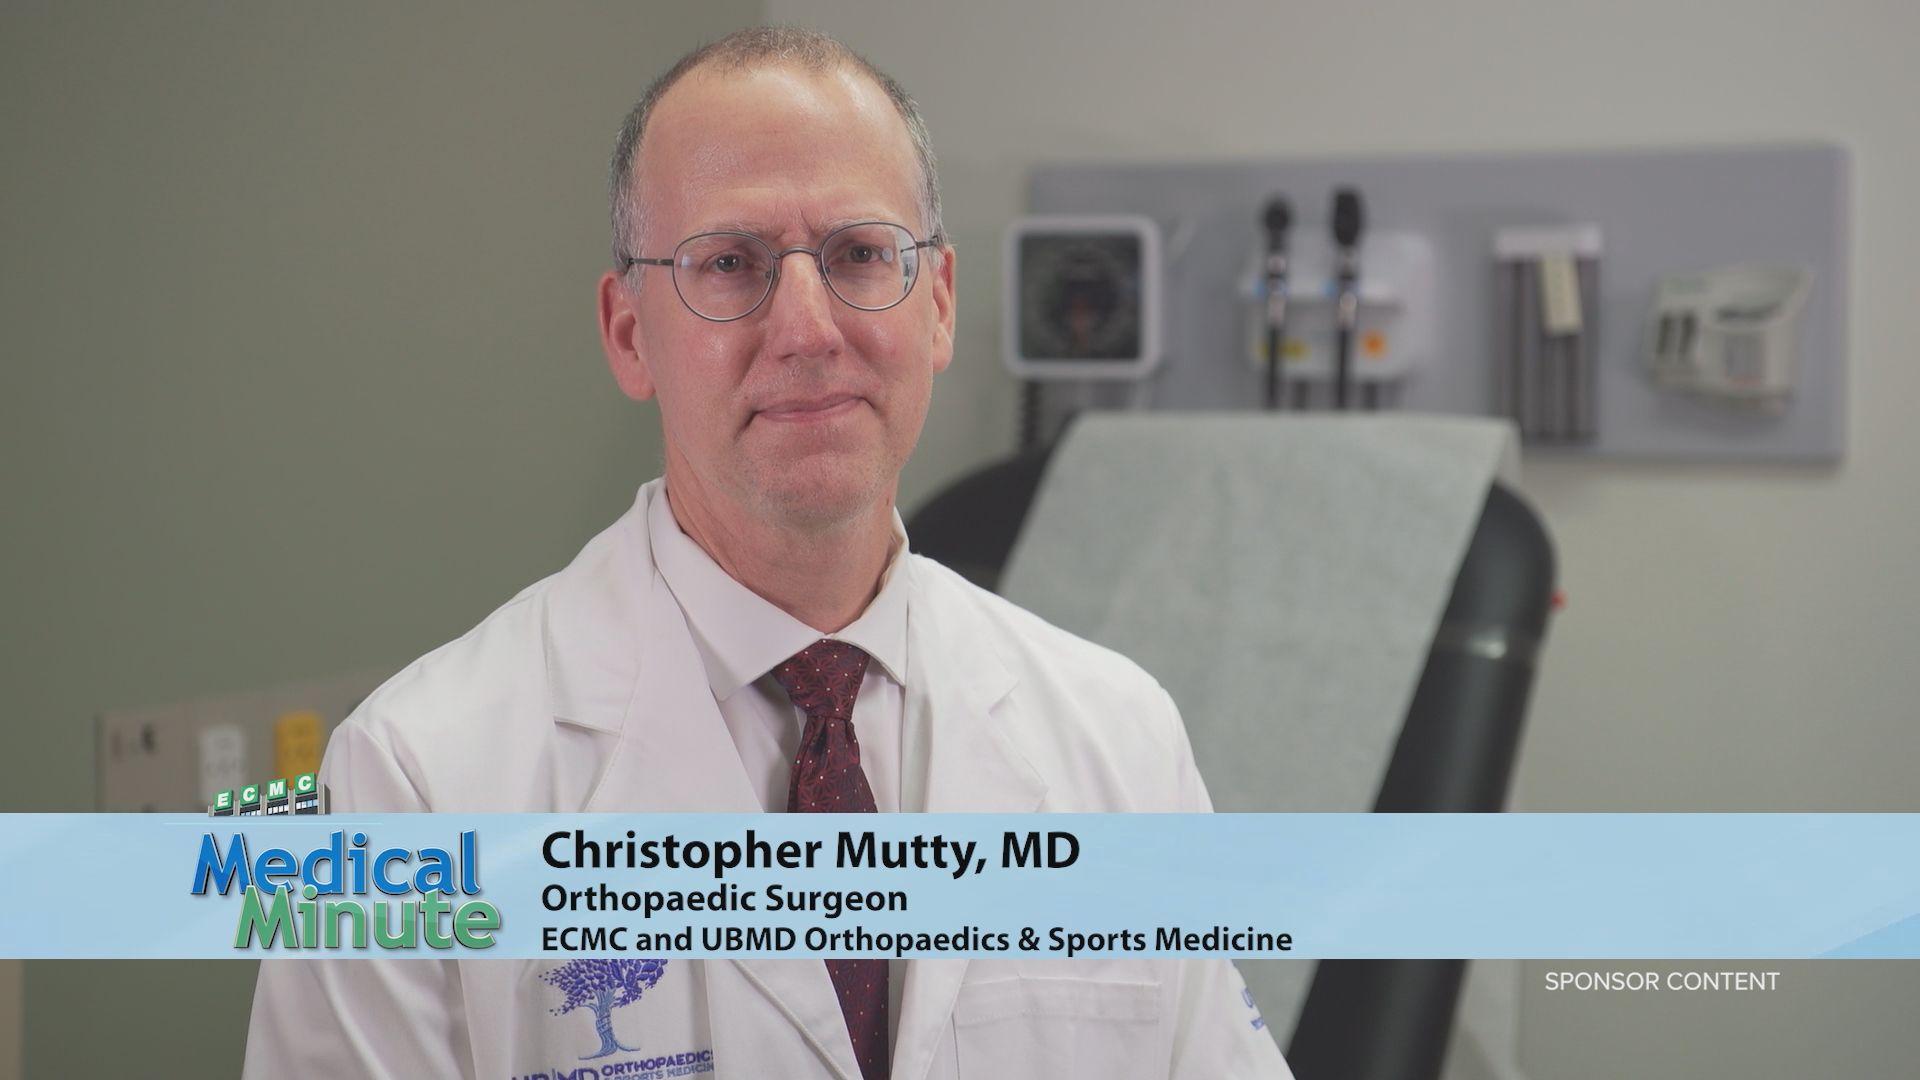 ECMCMedicalMinute Dr.ChristopherMutty FractureCare 031521 STILL